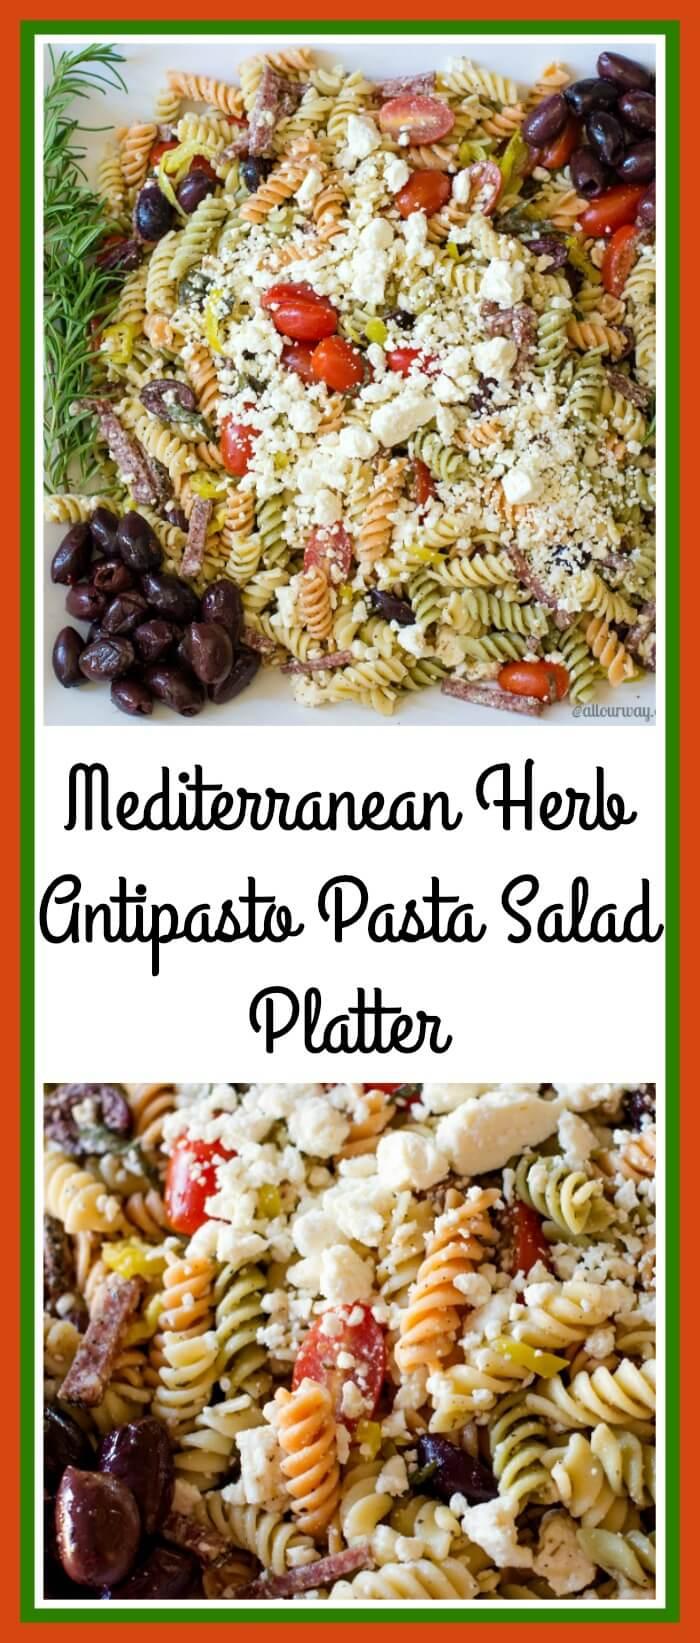 Mediterranean Herb Antipasto Pasta Salad Platter - a taste of Southern Italy @allourway.com